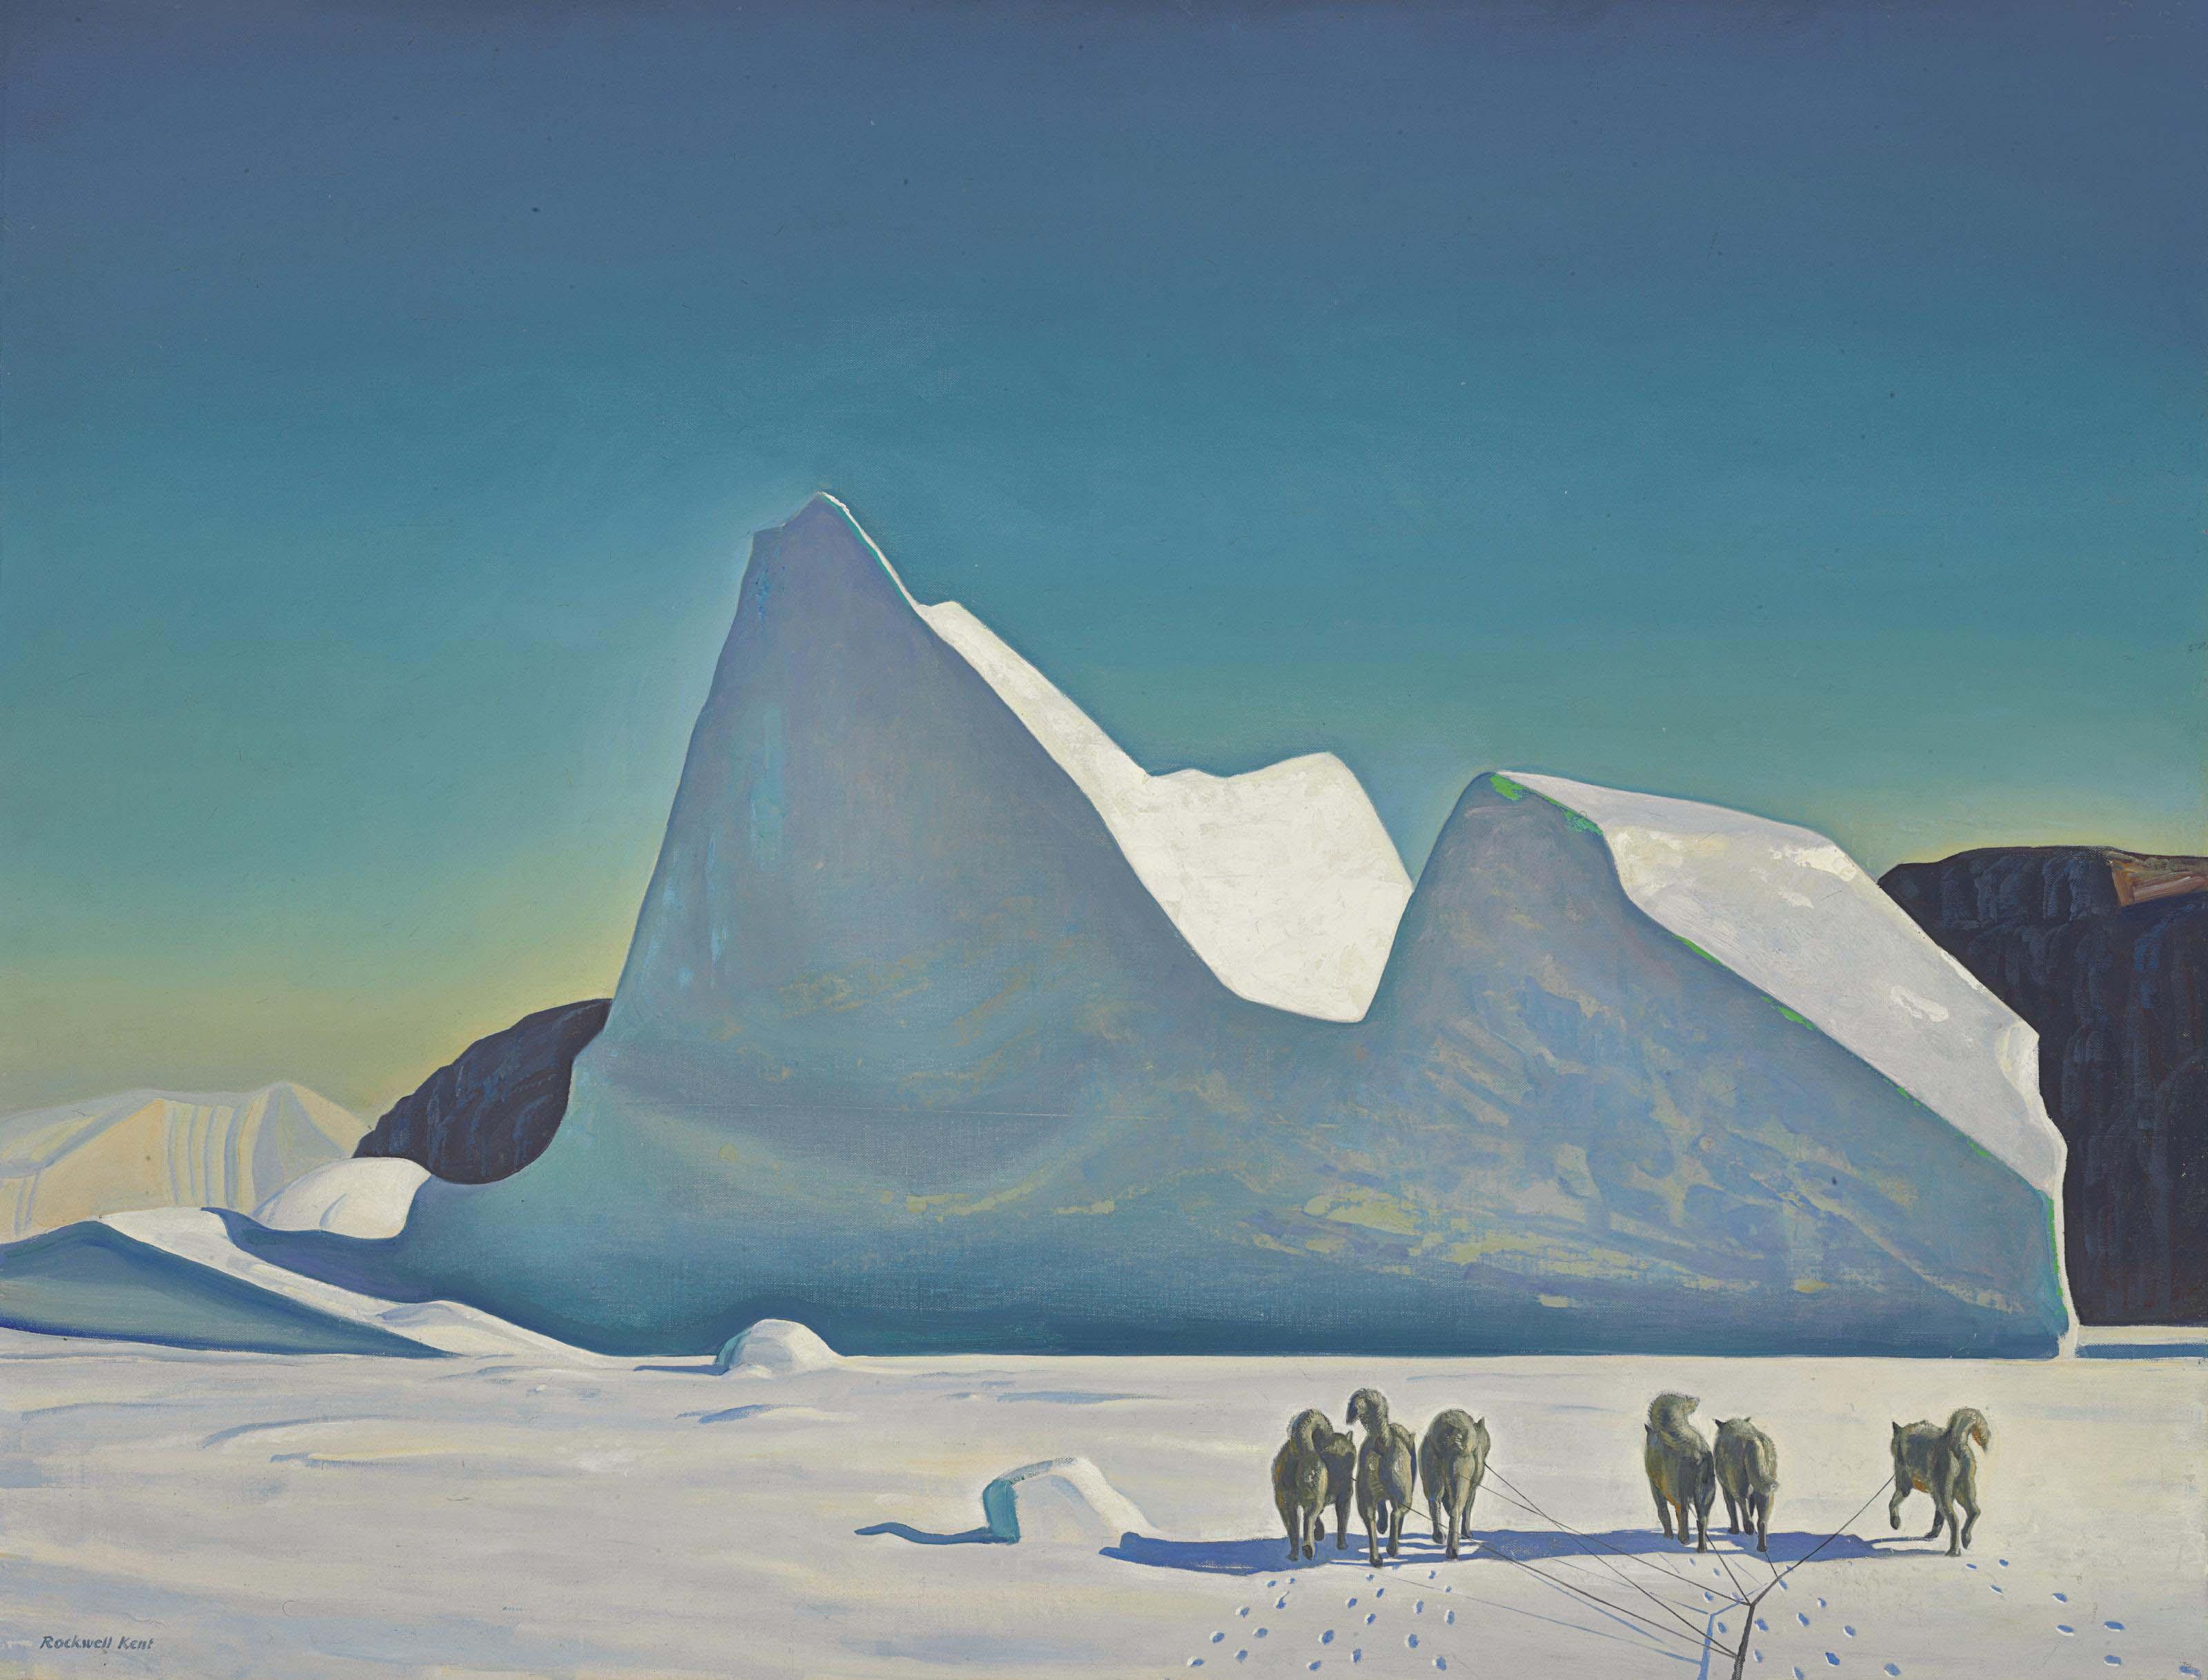 Iceberg; Sledge Dogs, Greenland